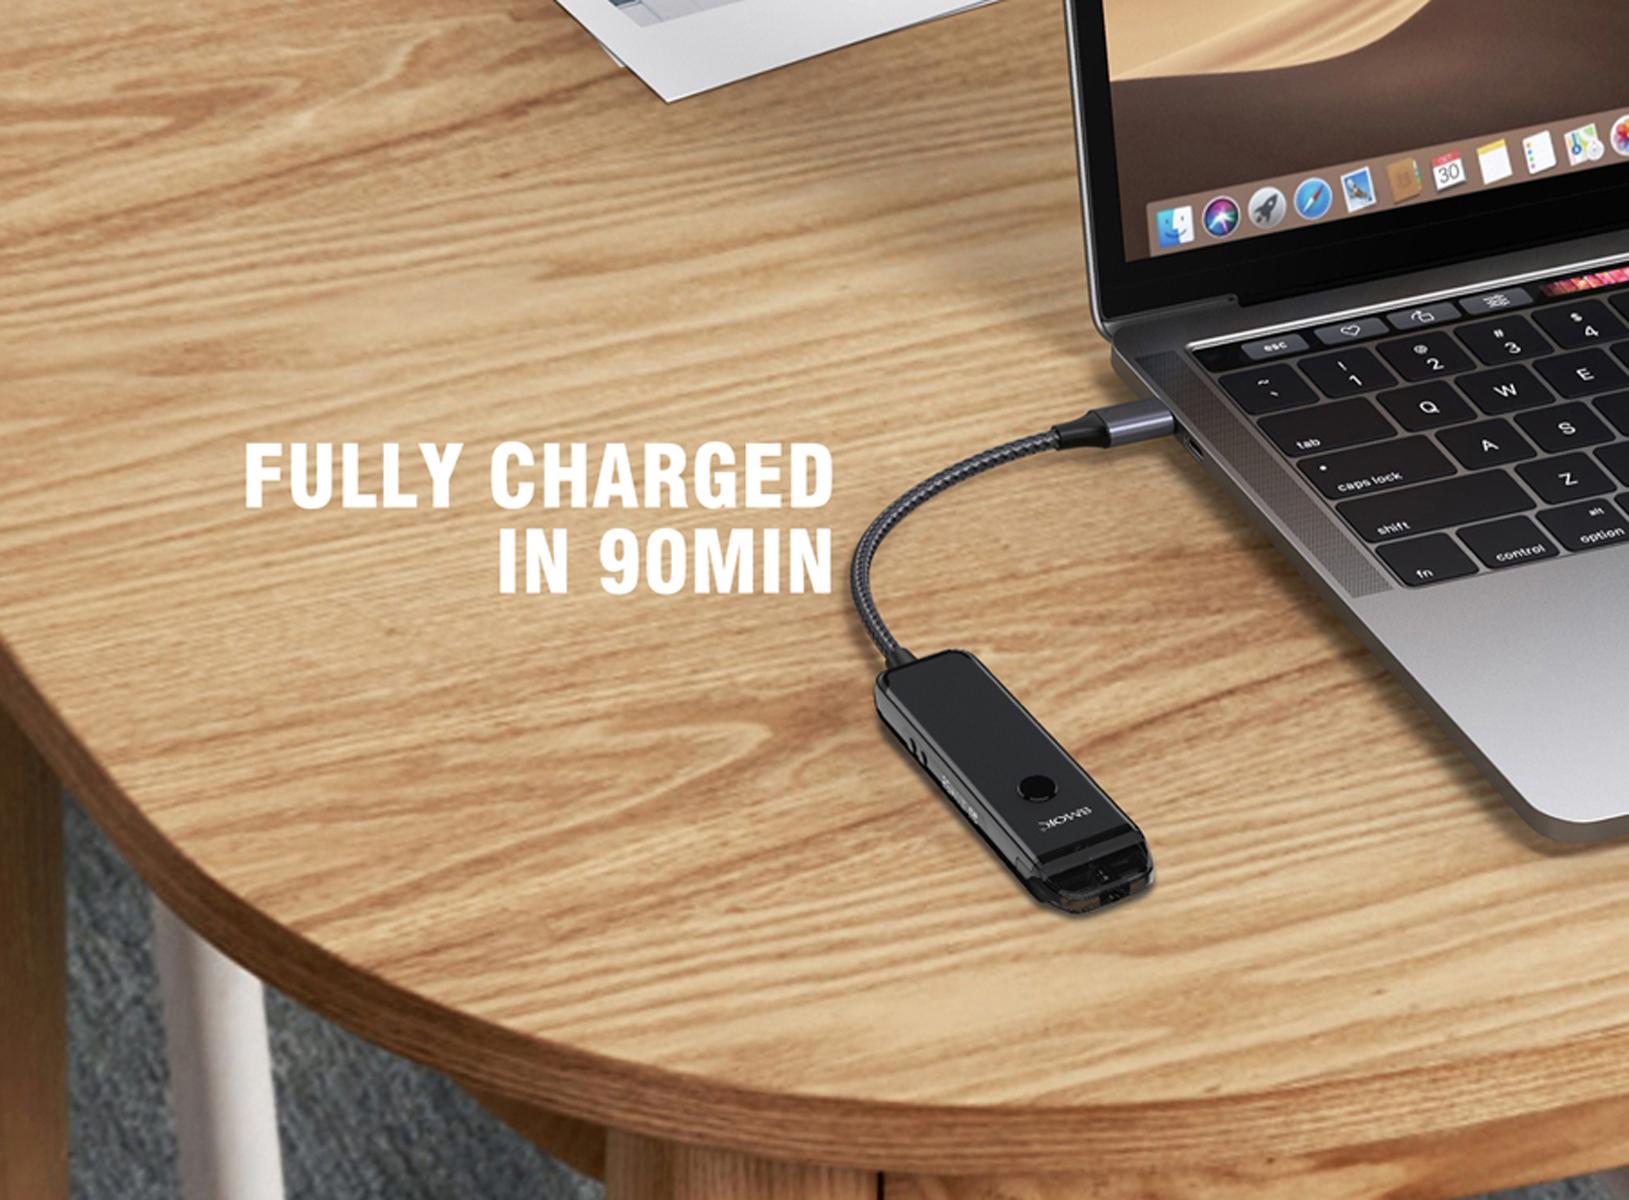 90min charge